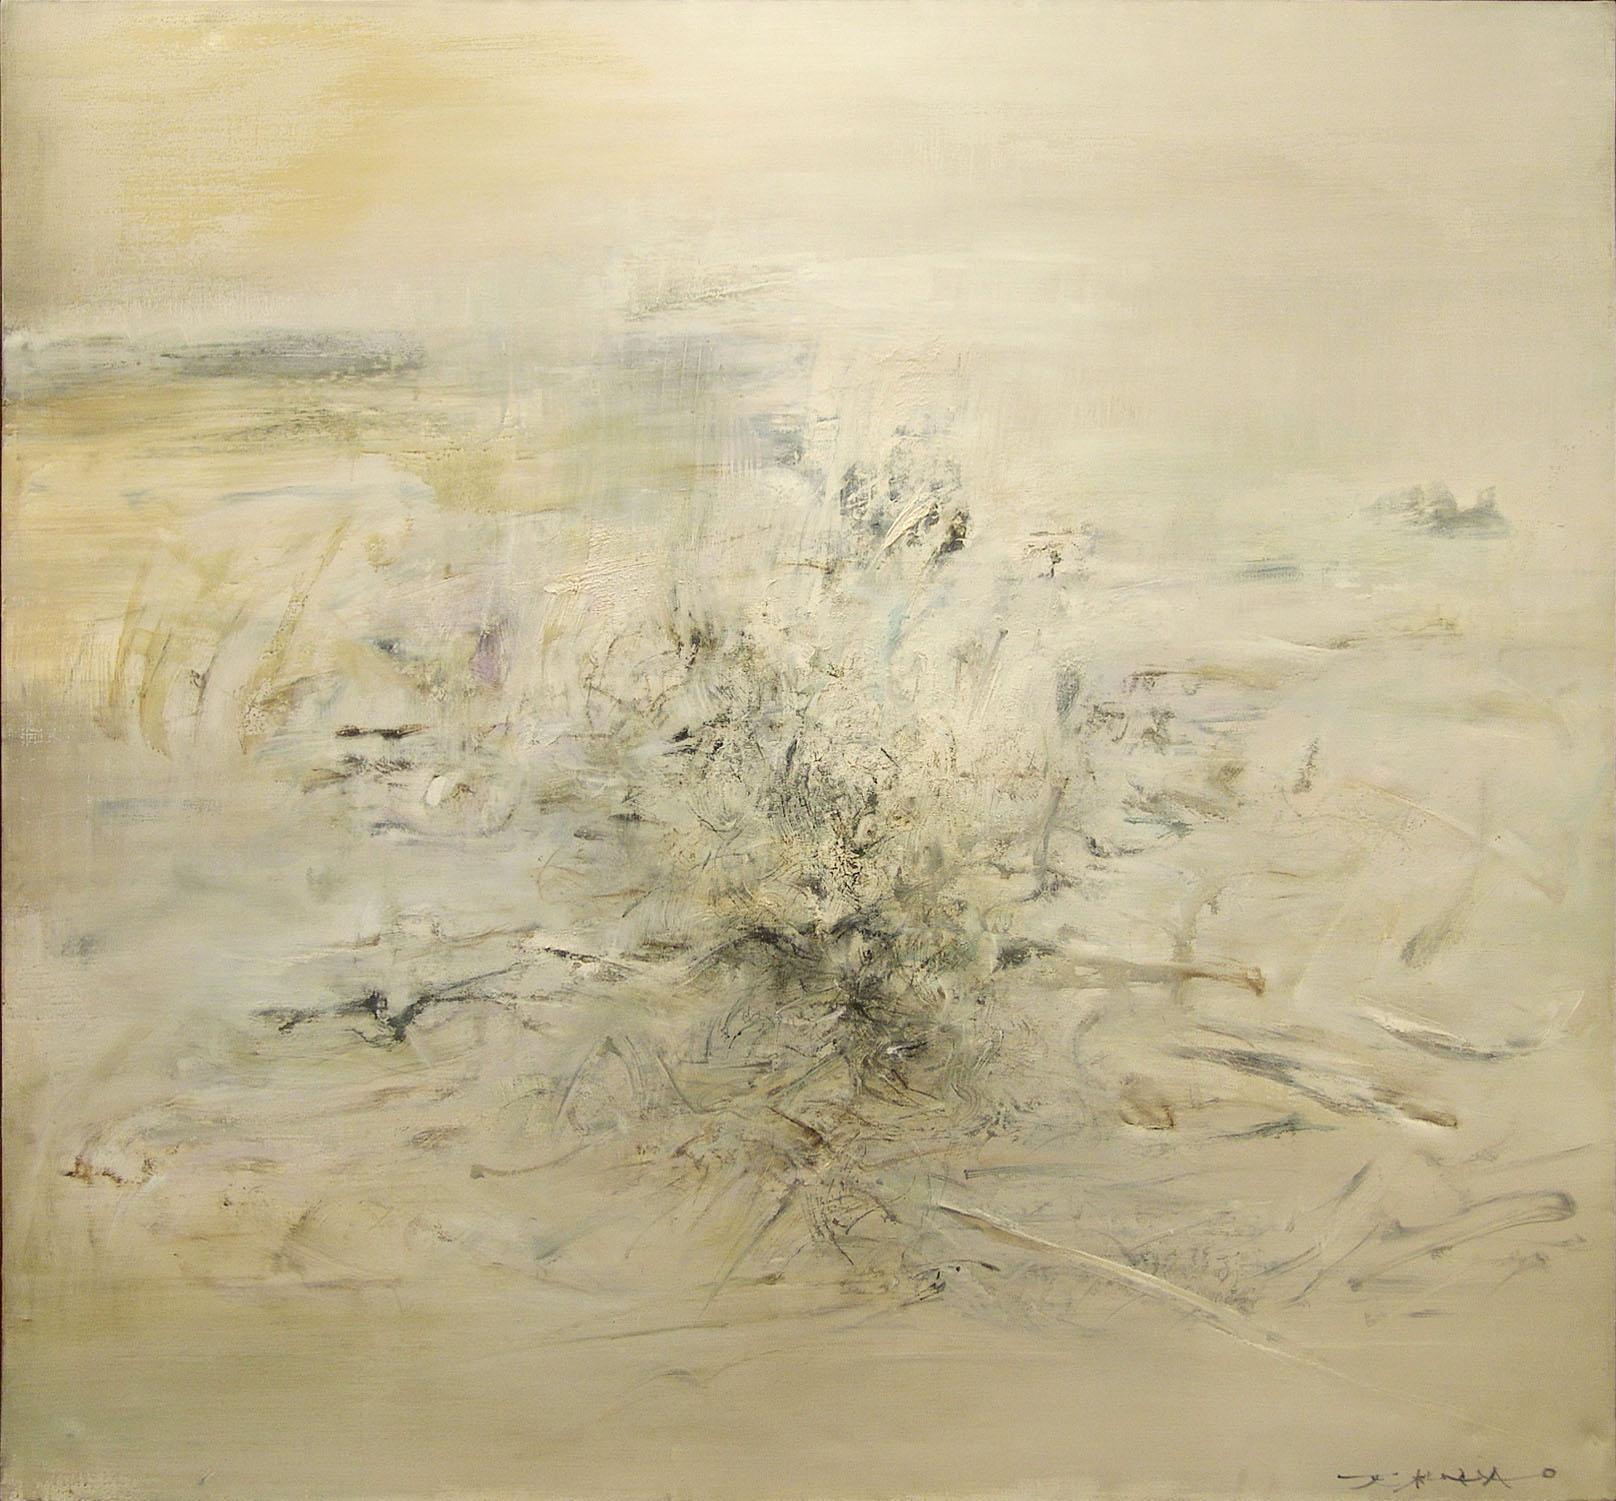 Zao Wou-Ki, ' 02.07.62 ' (1962, 152 x 164 cm). All rights reserved.